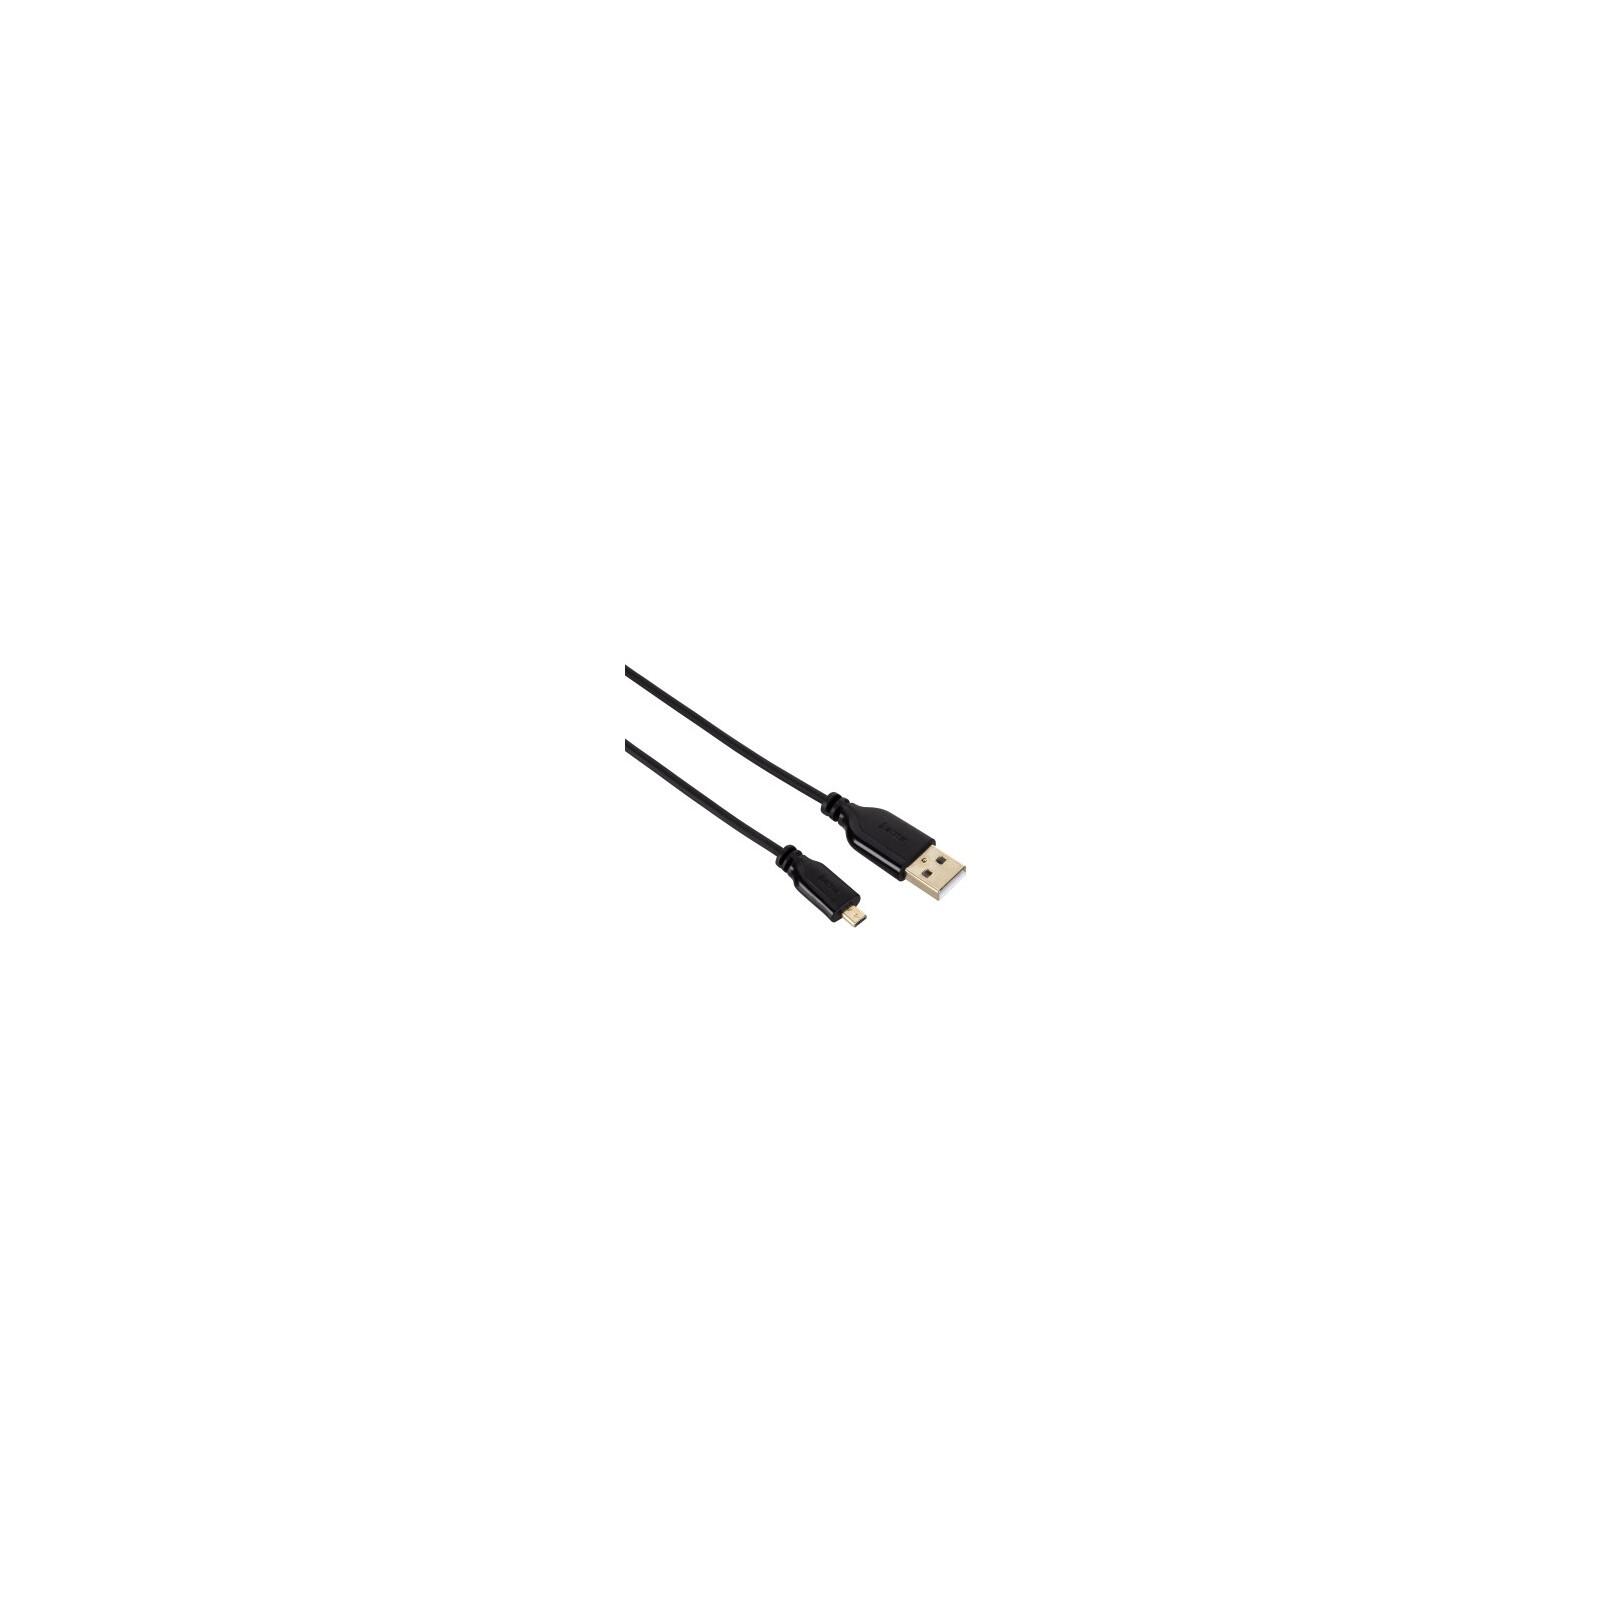 Hama USB-2.0 Anschlusskabel 0,75m